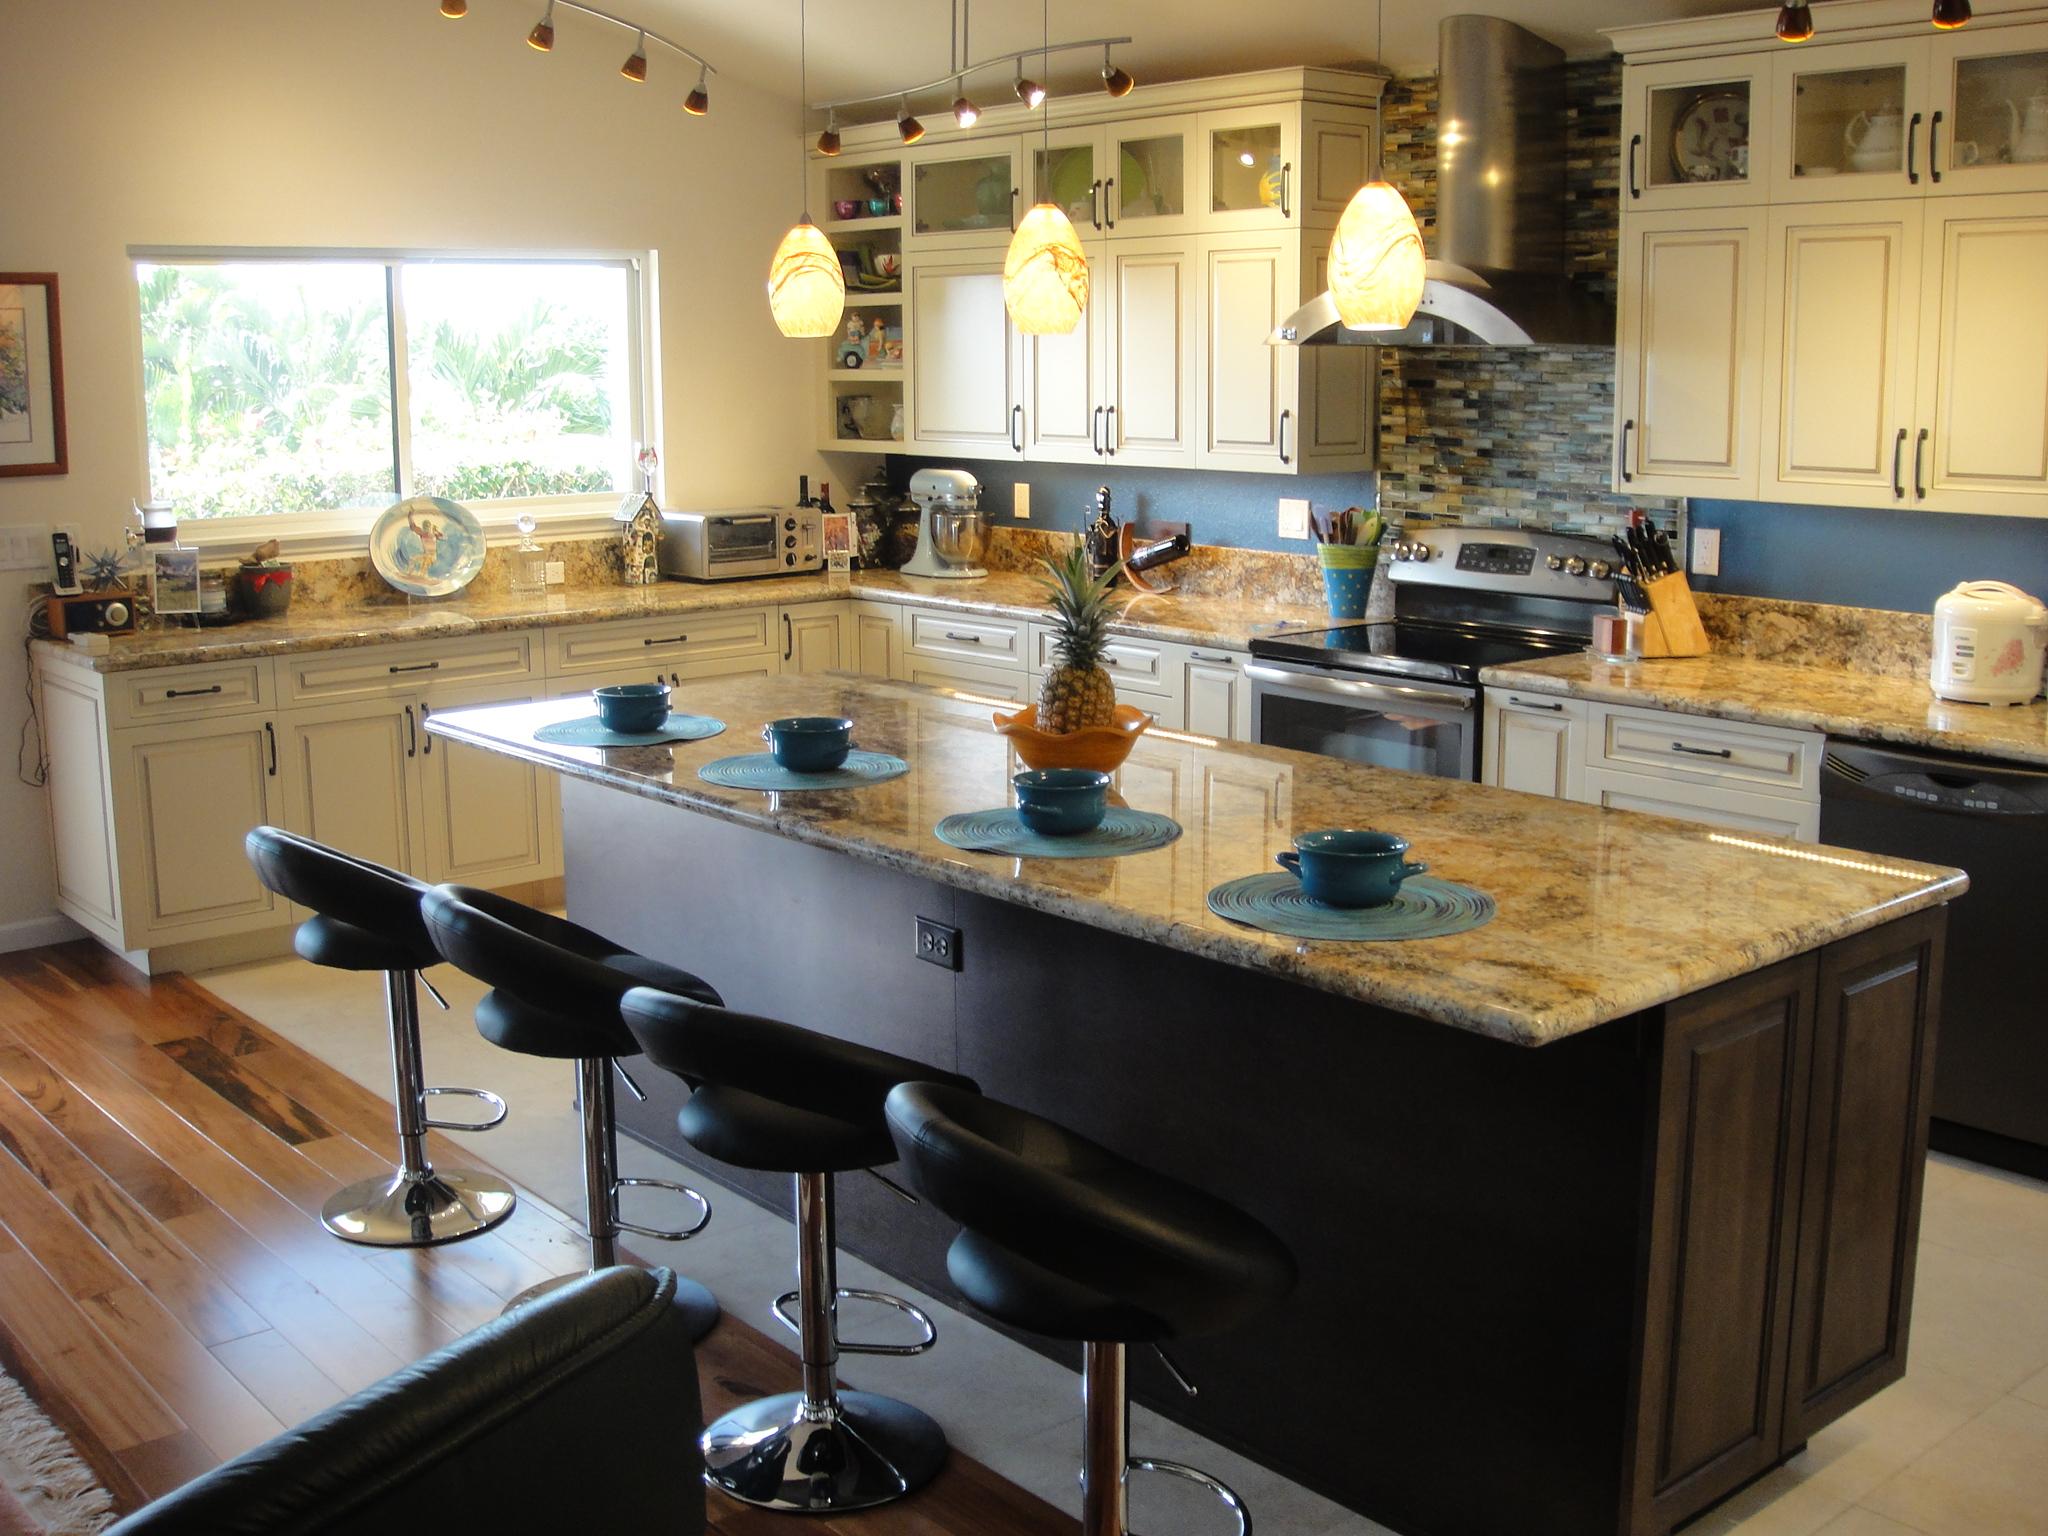 kitchen kitchen remodel hawaii Royal Kunia residence Kitchen